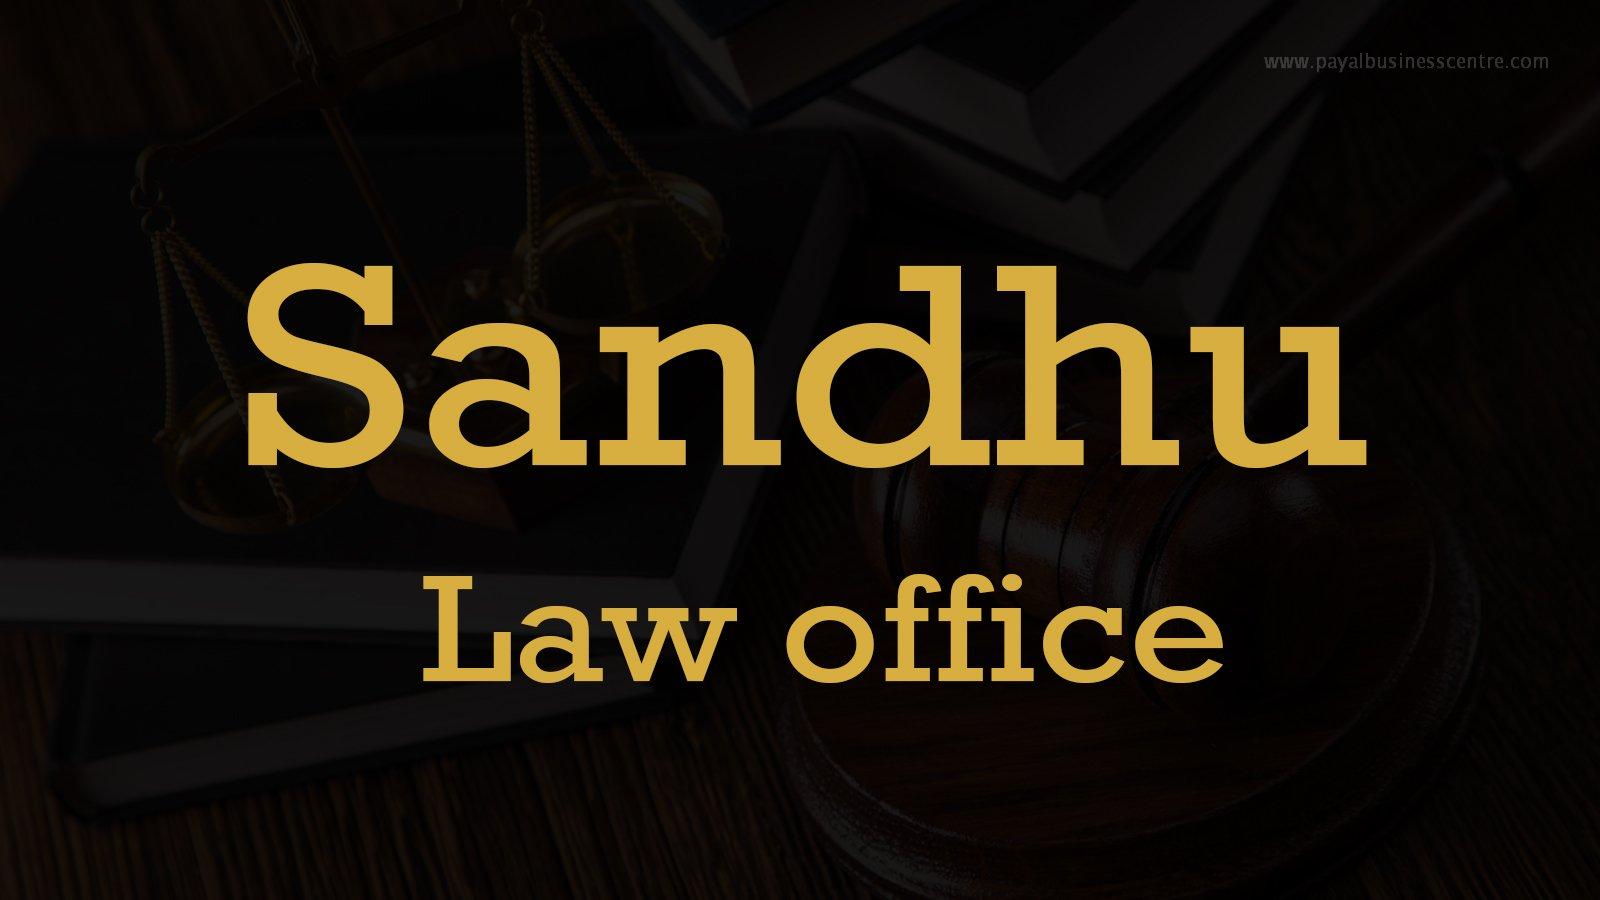 Sandhu Law office - Lawyers - 8128 128 St